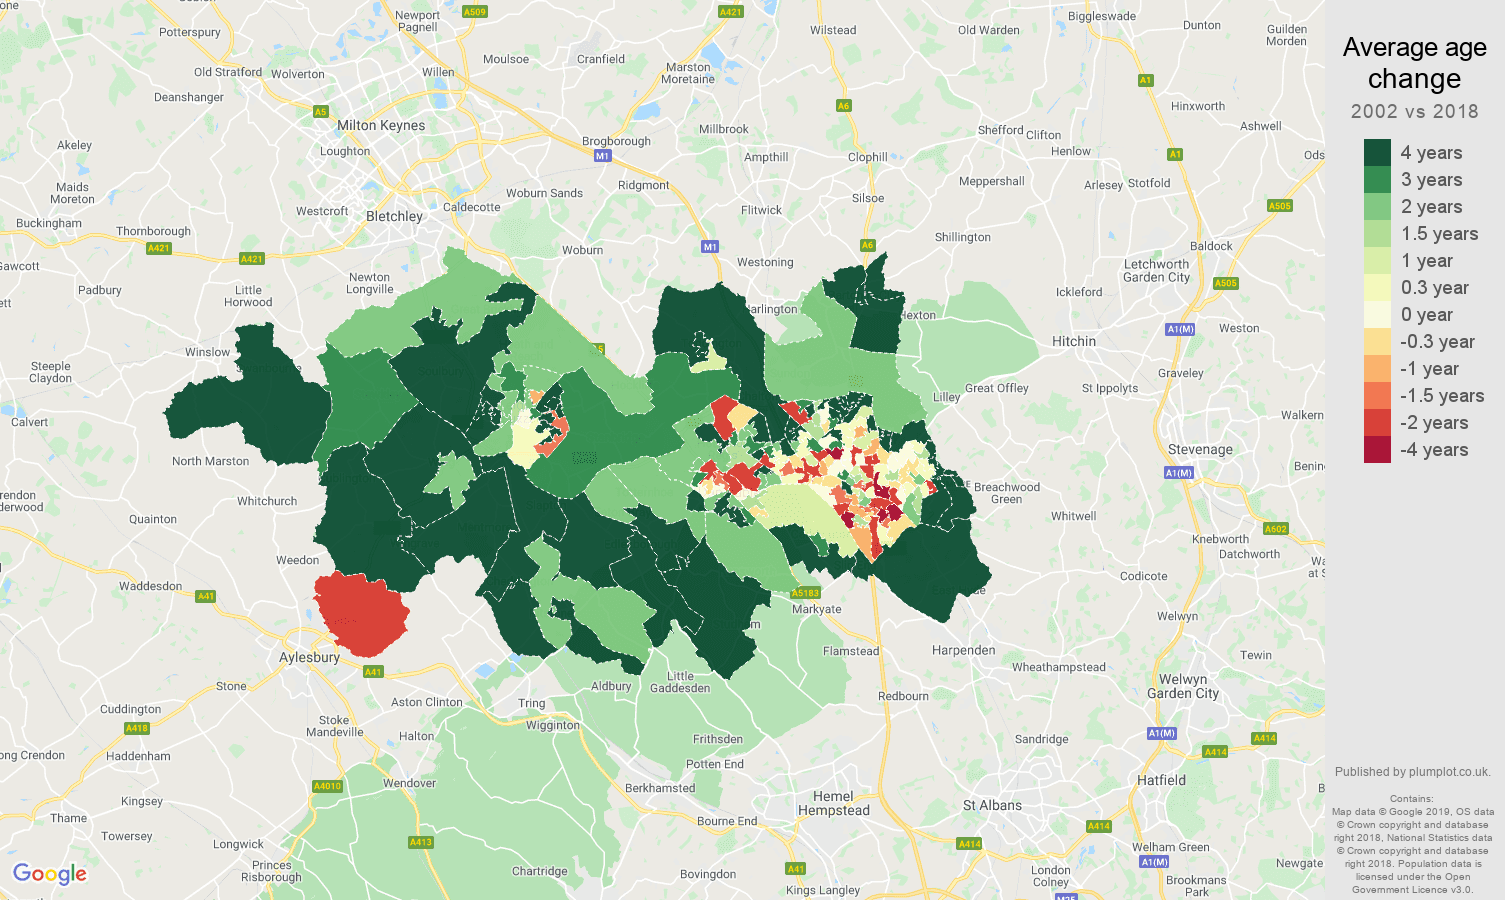 Luton average age change map